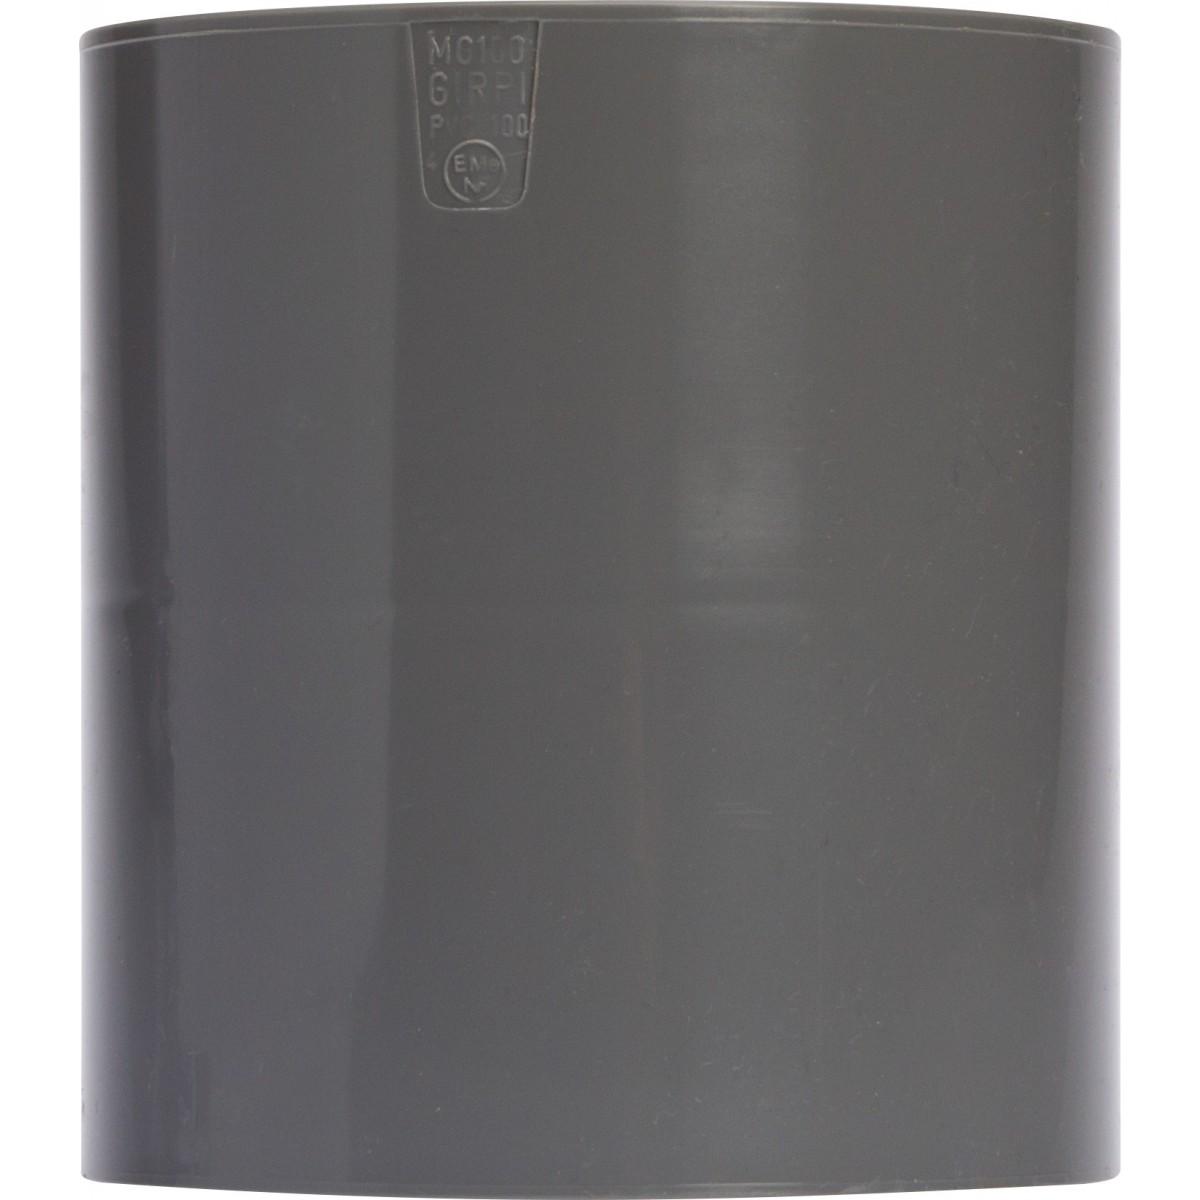 Manchon avec butée intérieure Femelle / Femelle Girpi - Diamètre 100 mm